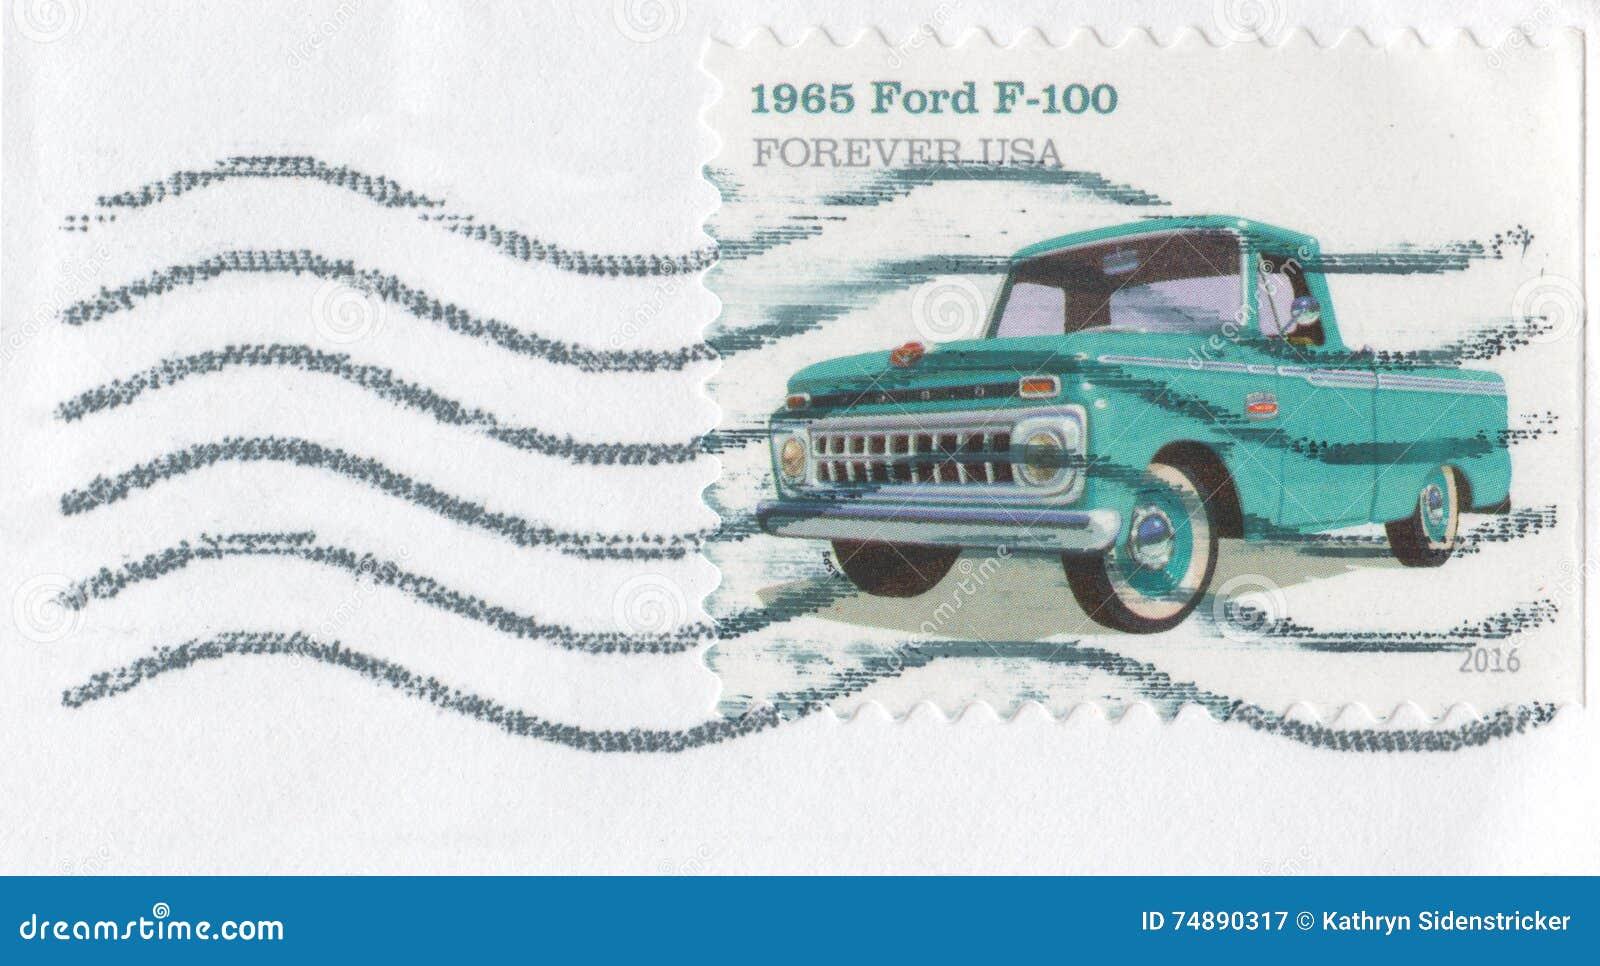 2016 carimbe para sempre Ford Pickup 1965